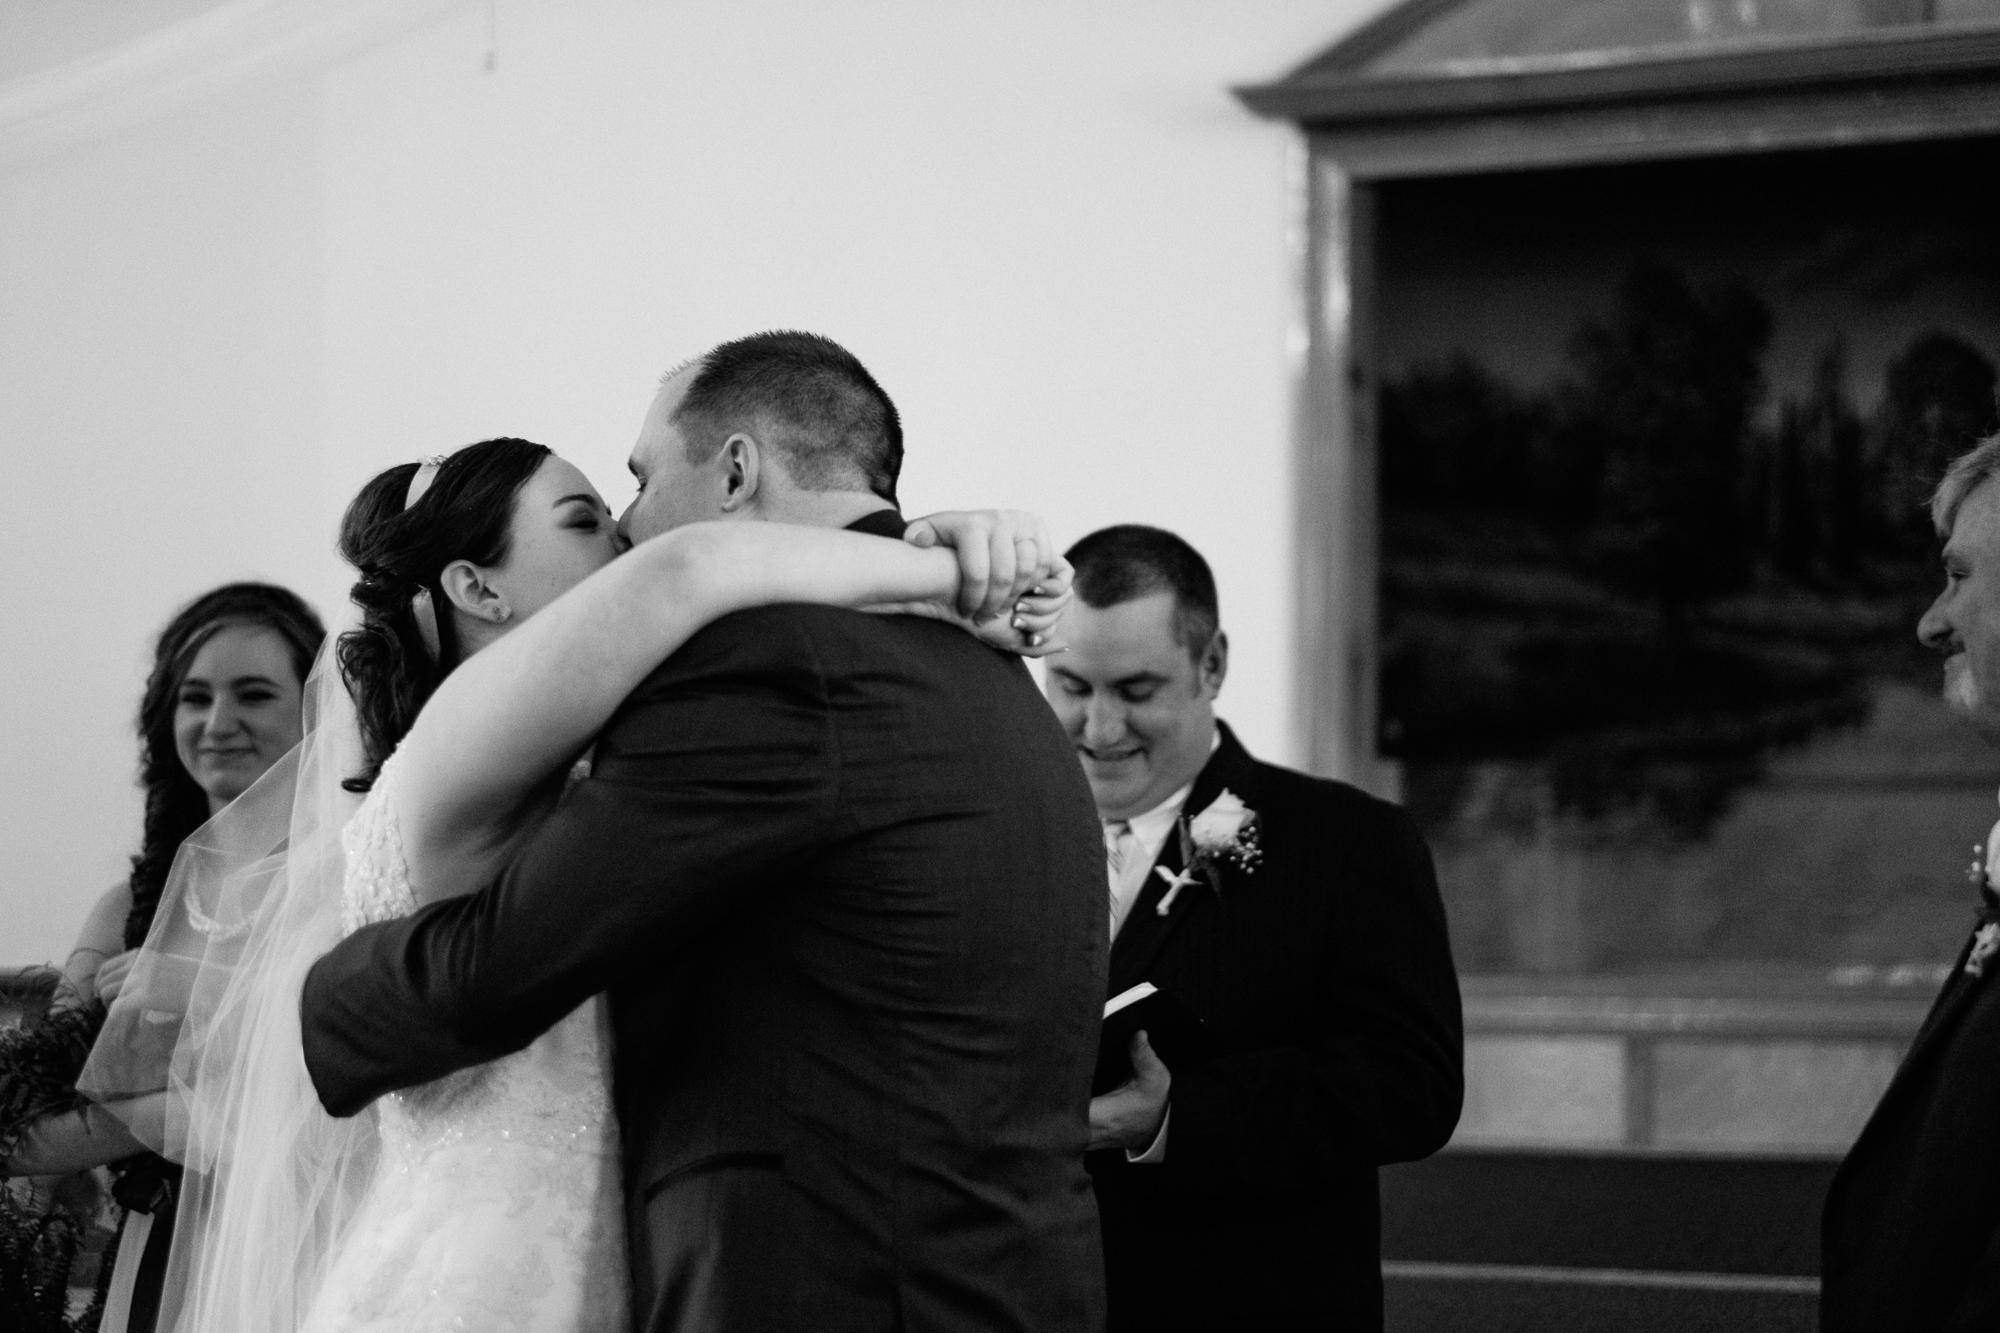 Emily-Shay-wedding-blog-20.jpg